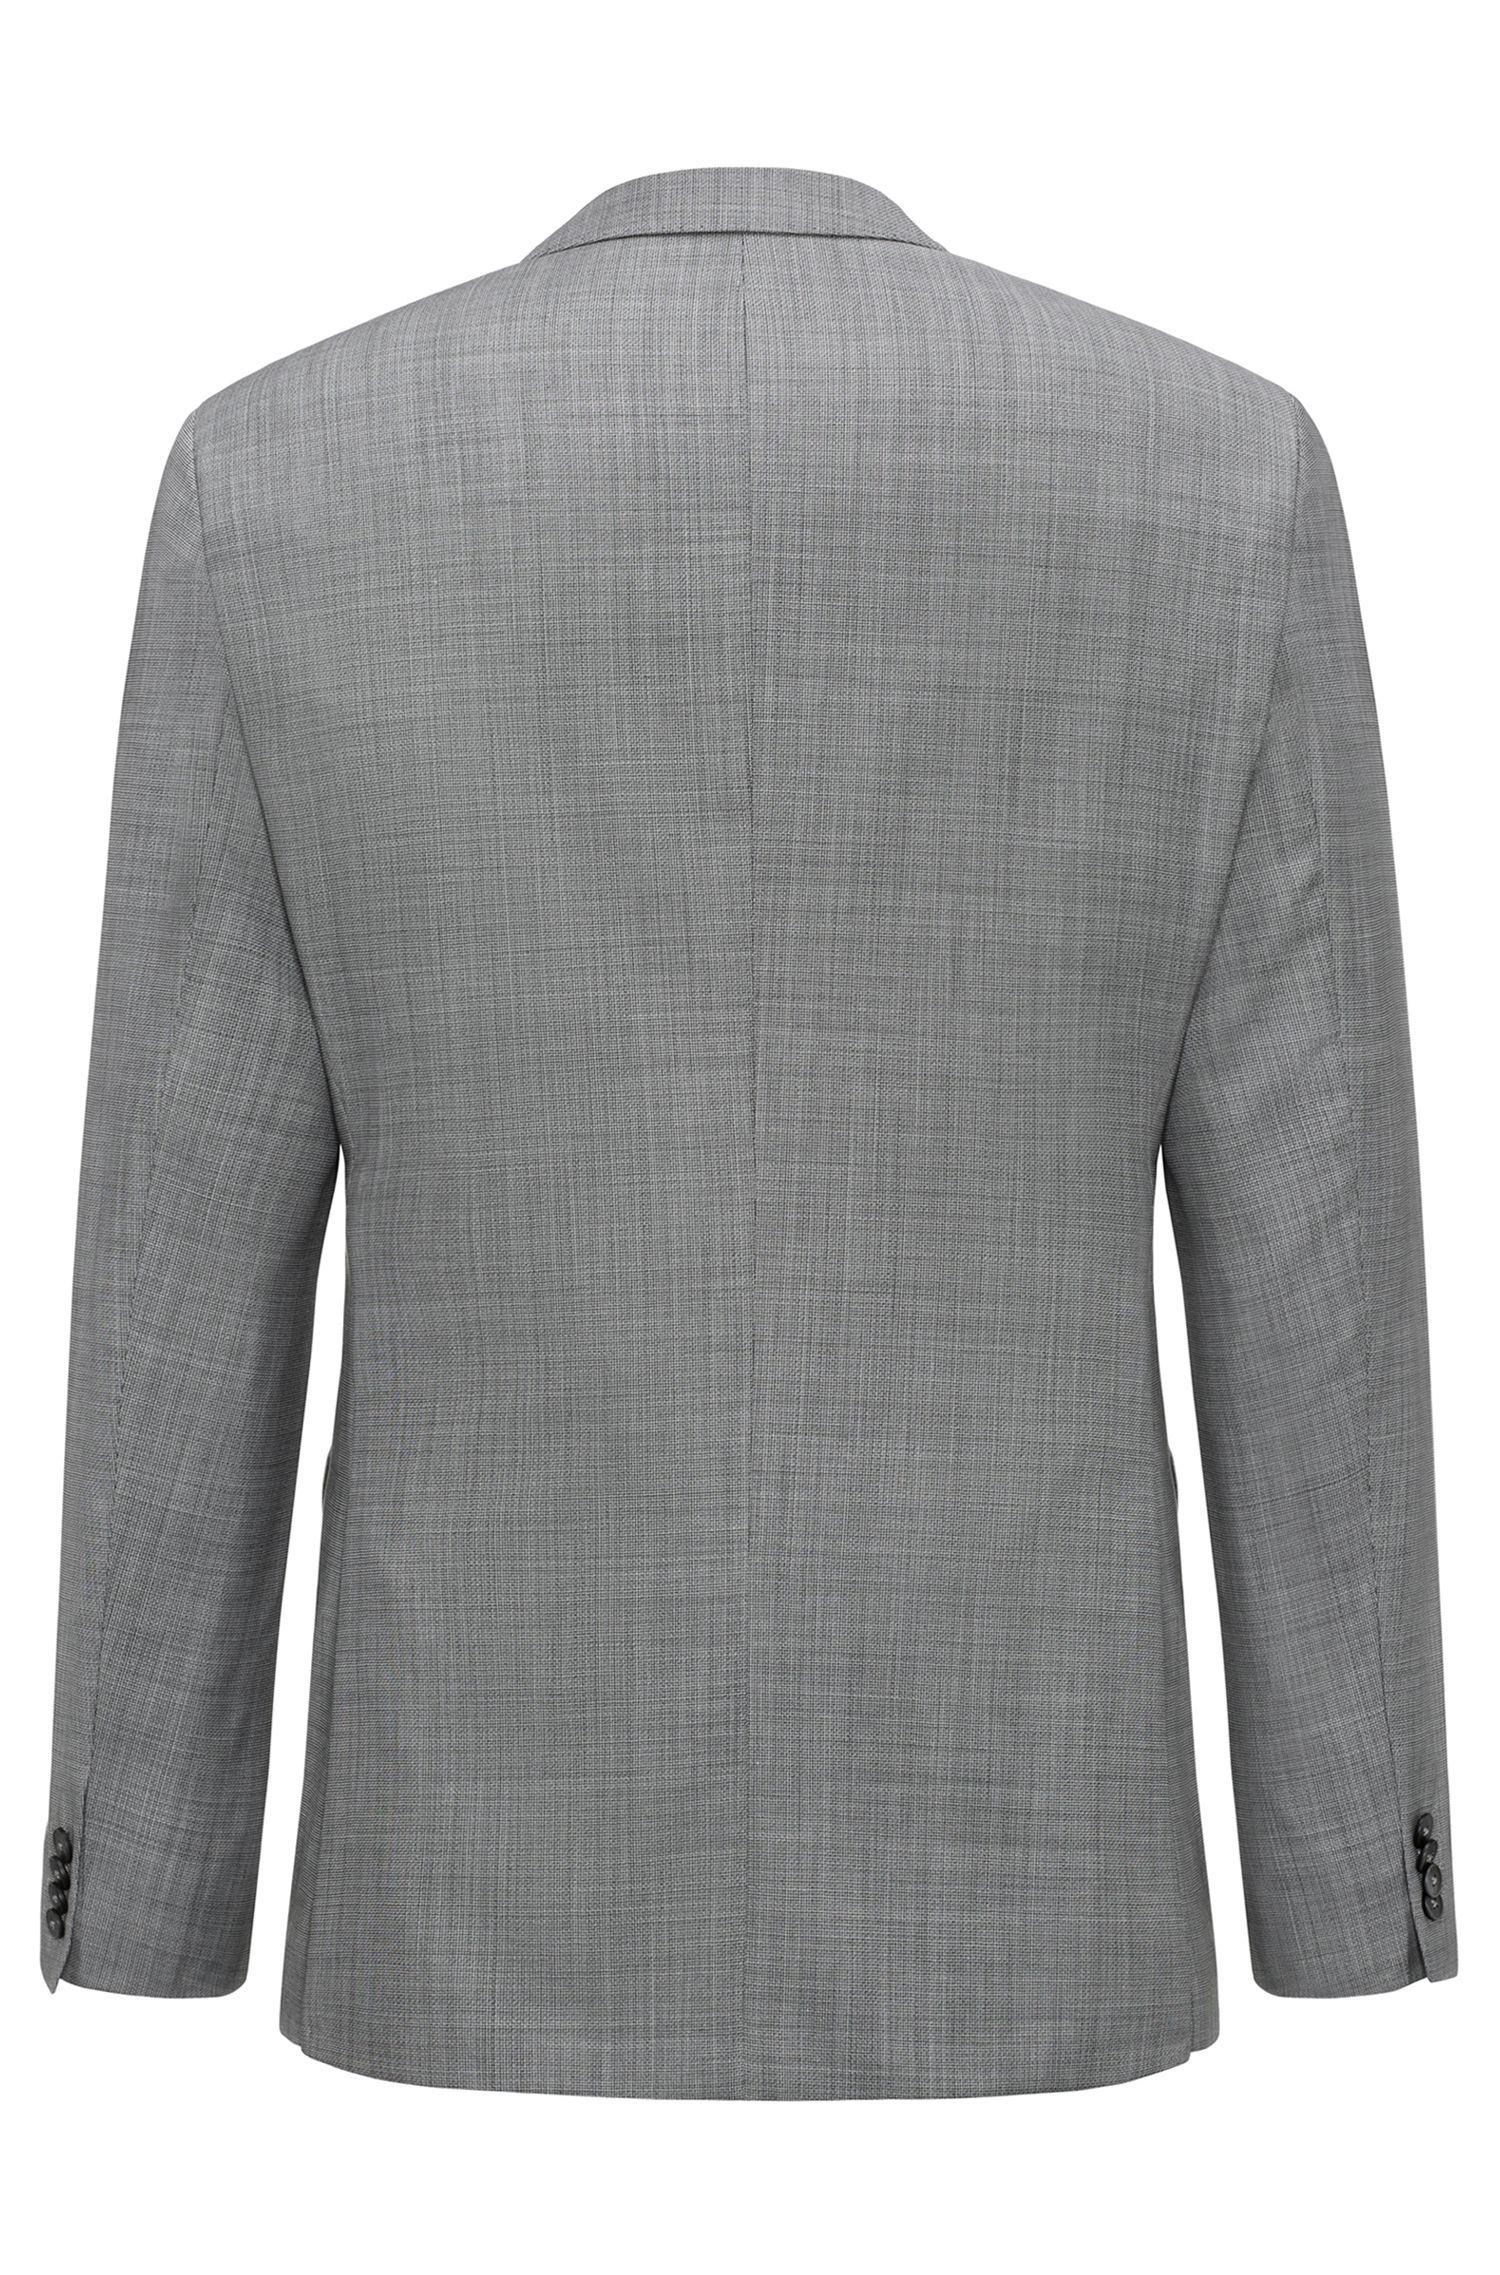 Gemusterter Regular-Fit Anzug aus Schurwoll-Mix